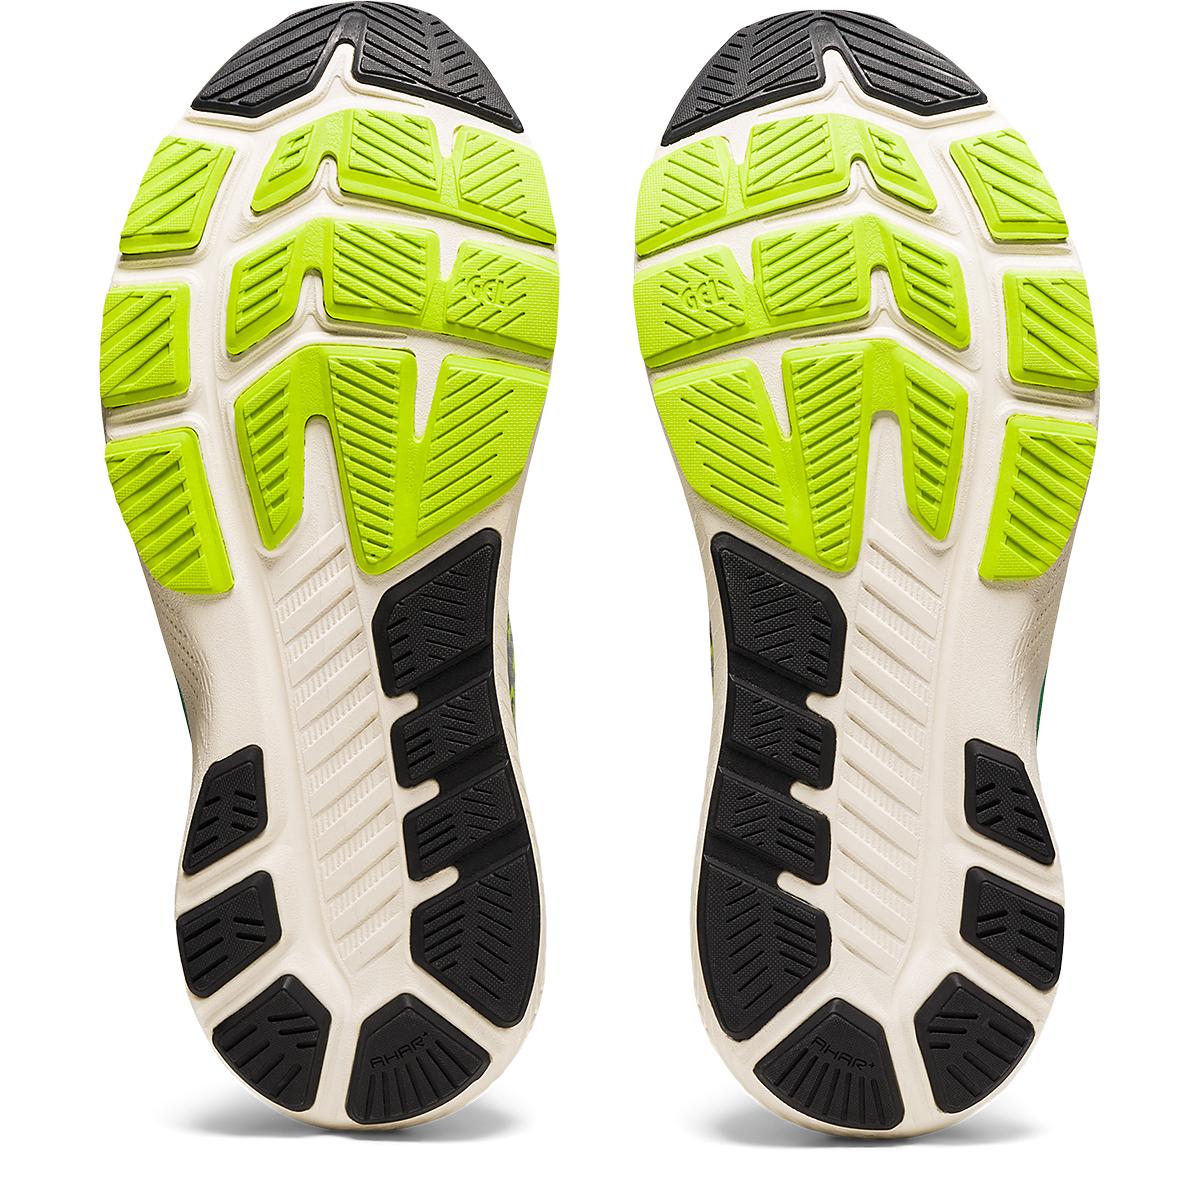 Men's Asics GEL-Kayano Lite Running Shoe - Color: Piedmont Grey/Sheet Rock - Size: 13 - Width: Regular, Piedmont Grey/Sheet Rock, large, image 7